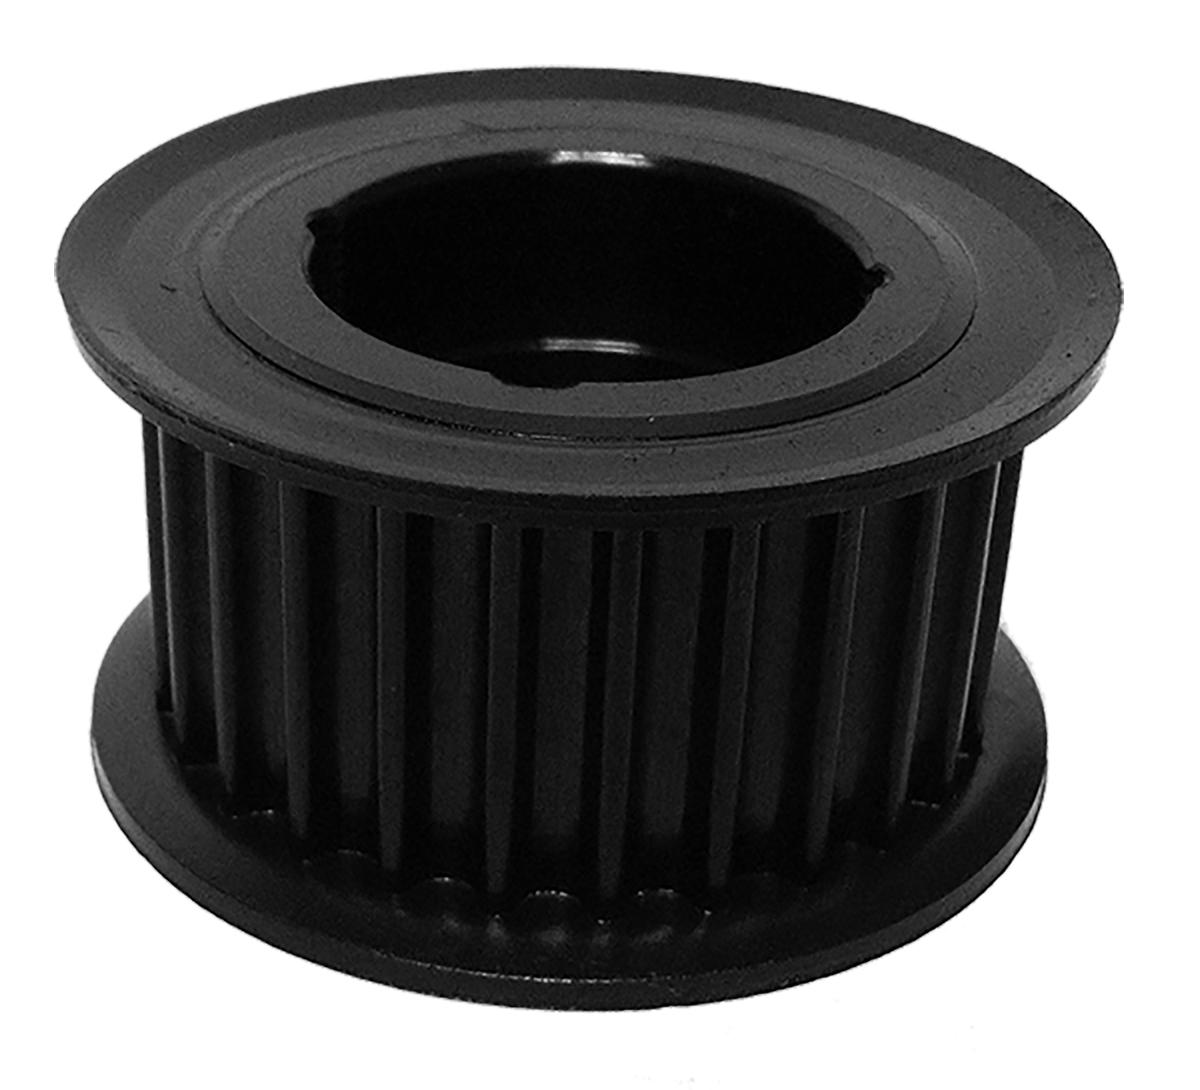 30-8P30-1210 - Steel Powerhouse® Pulleys